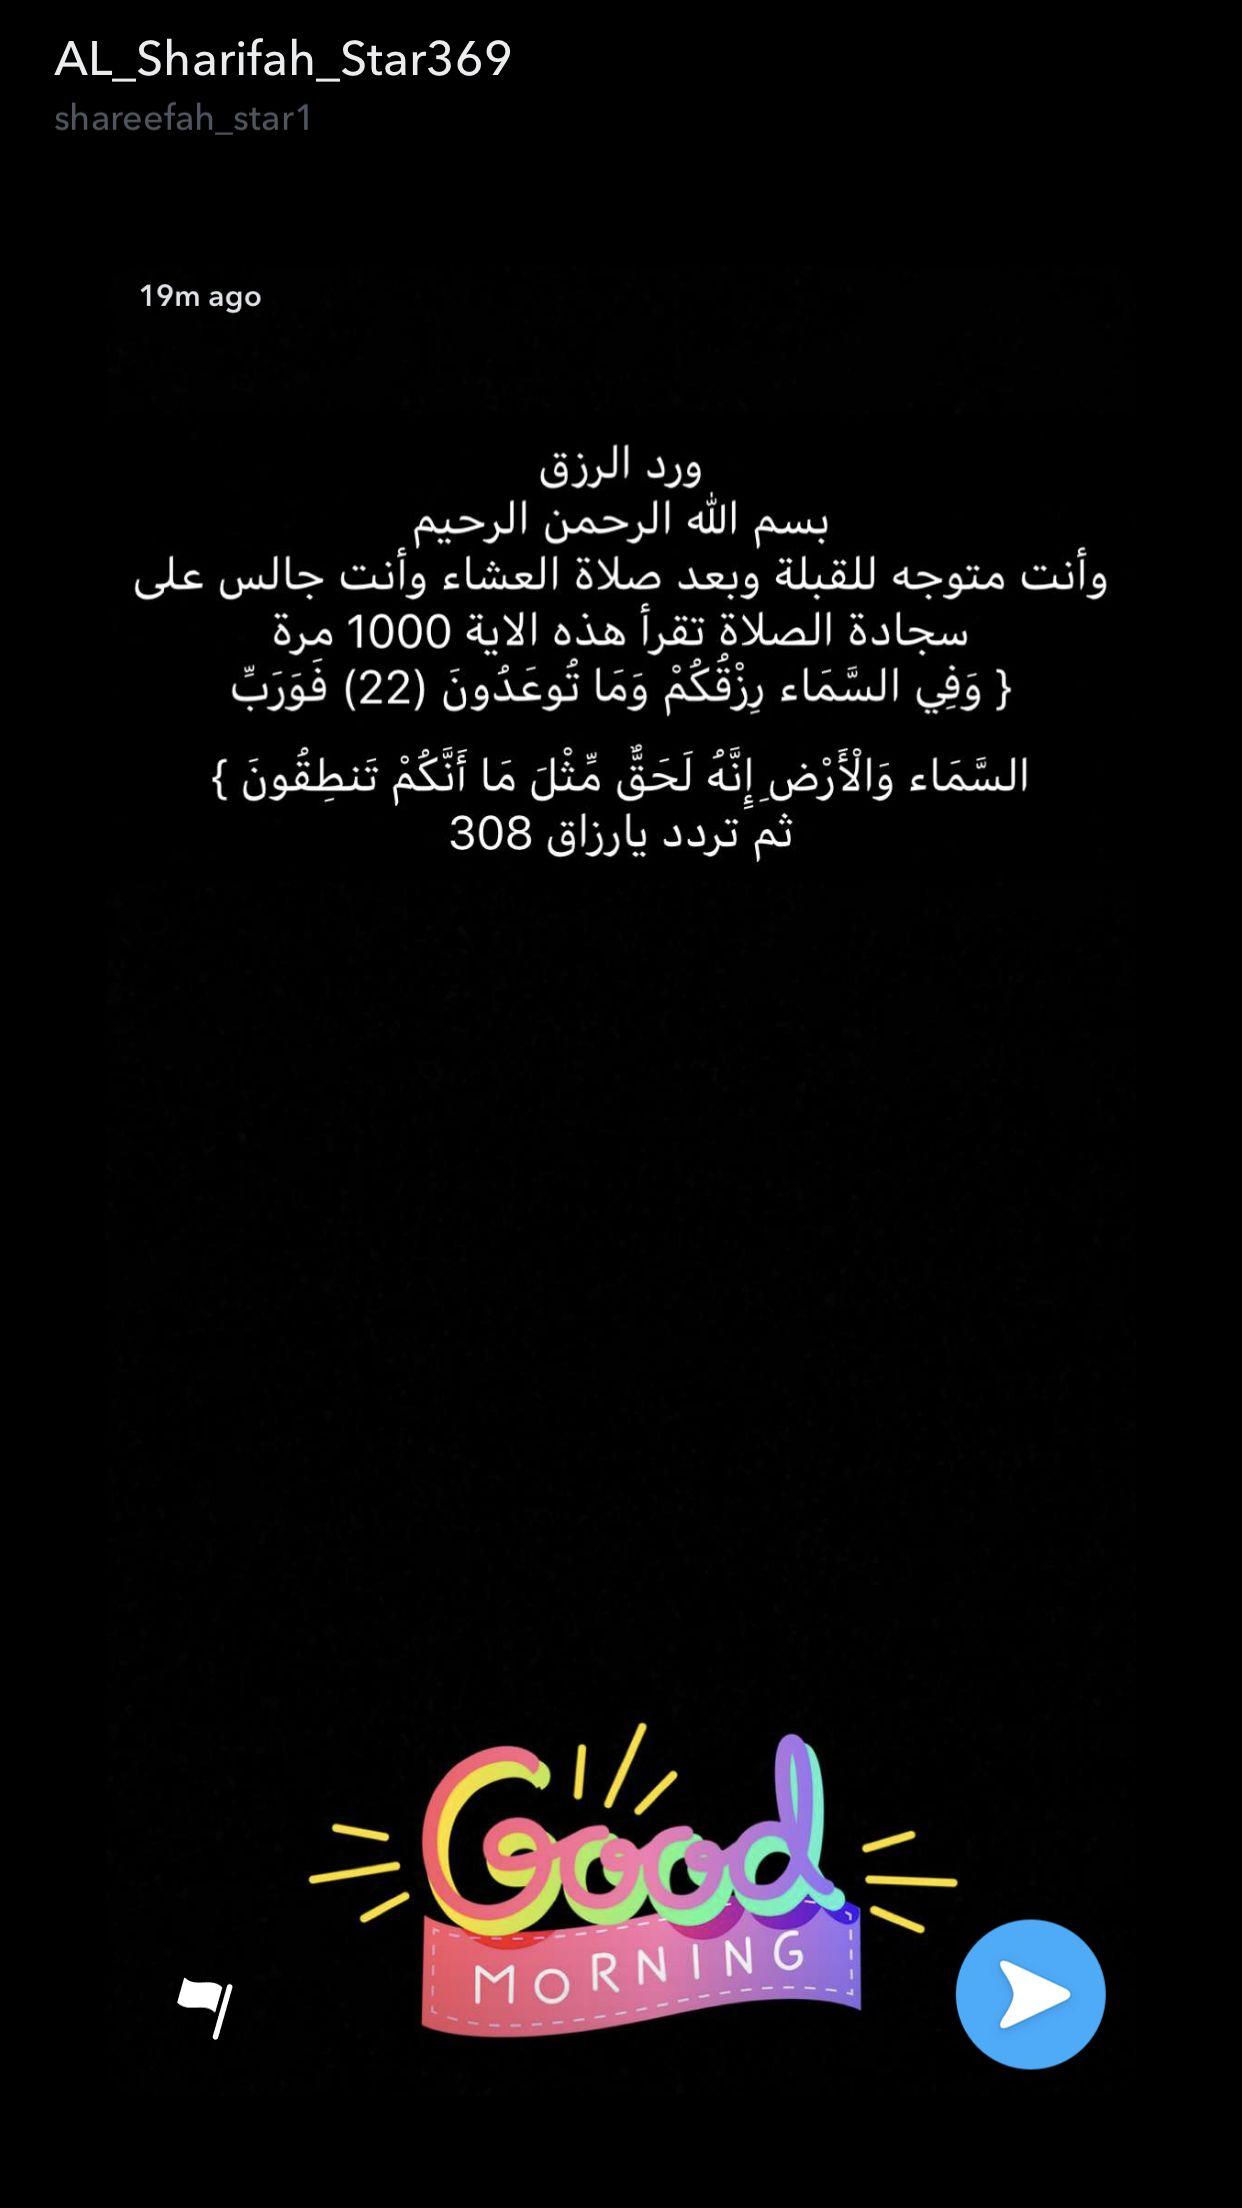 Épinglé par Dijasb sur دعاء Doua islam, Coran, Coran